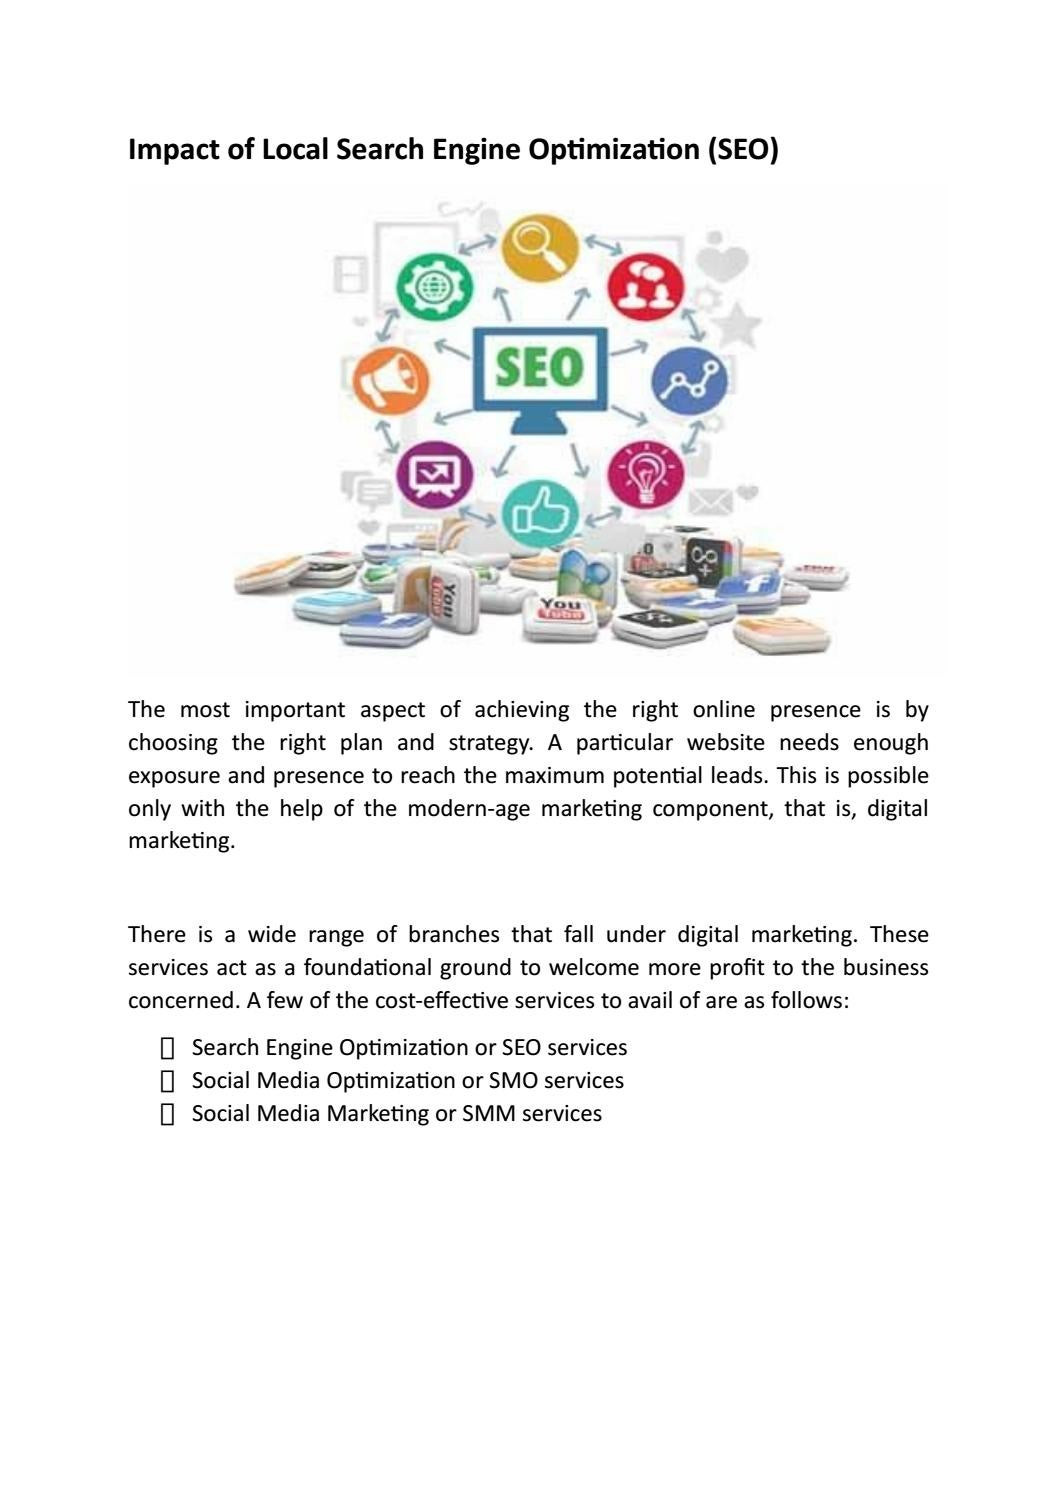 Impact of Local Search Engine Optimization (SEO)